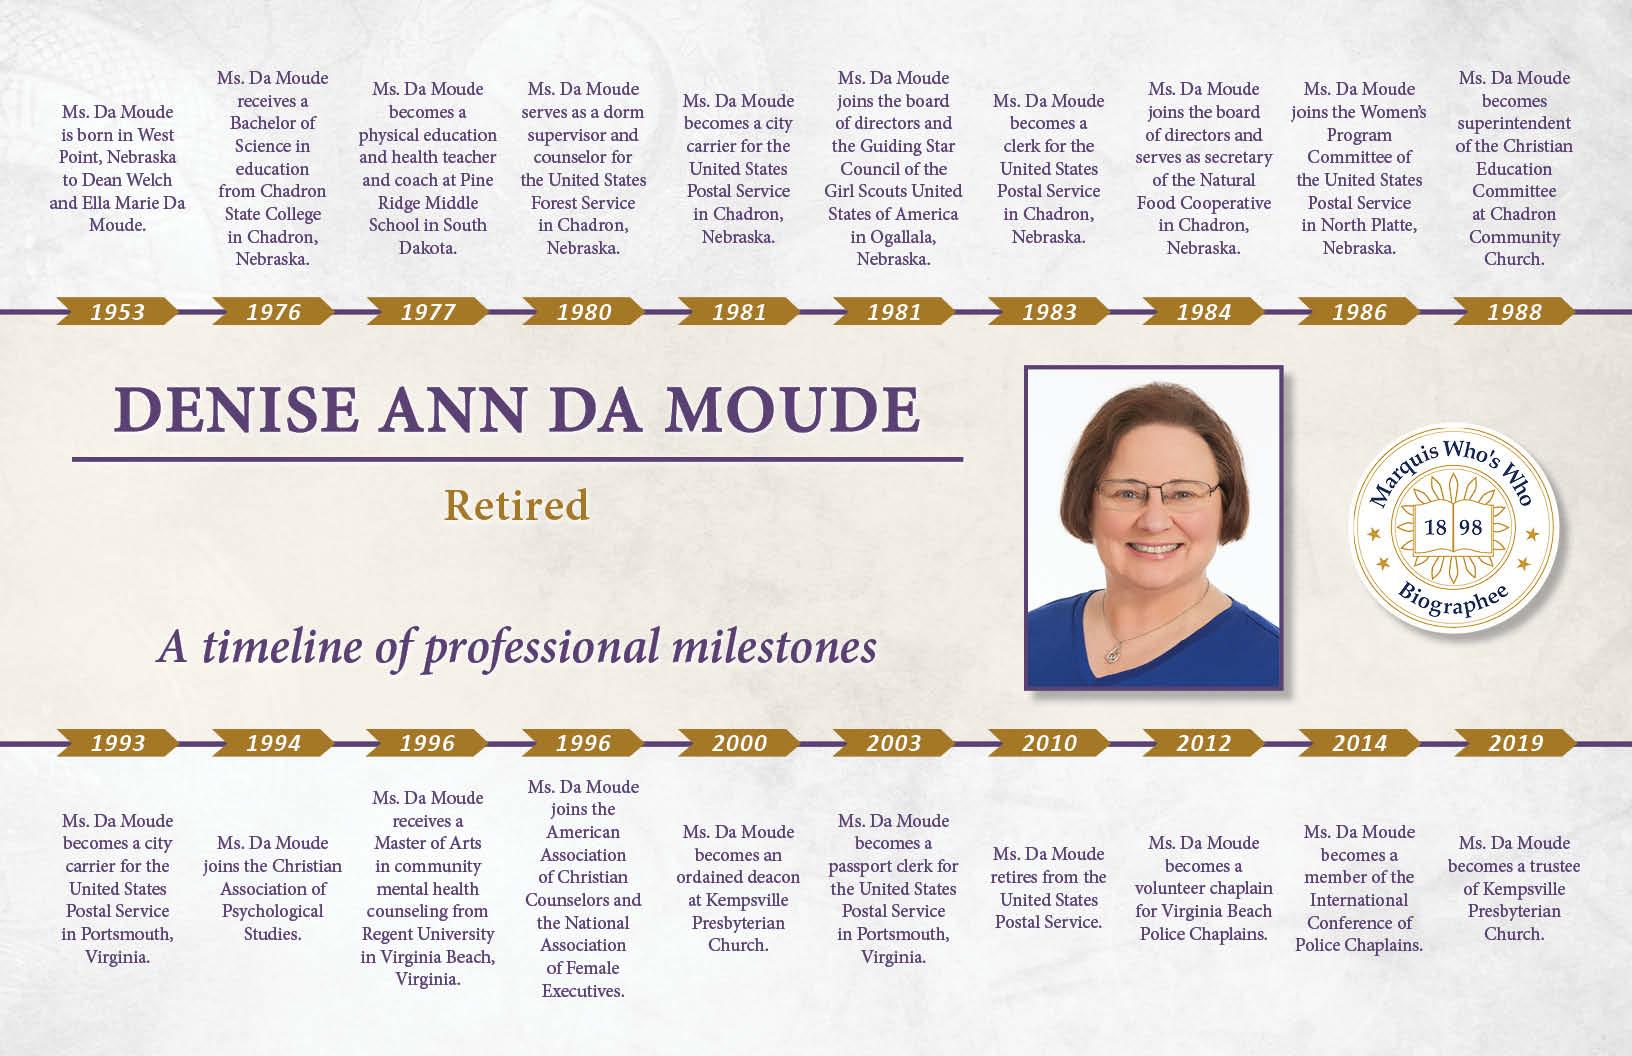 Denise DaMoude Professional Milestones